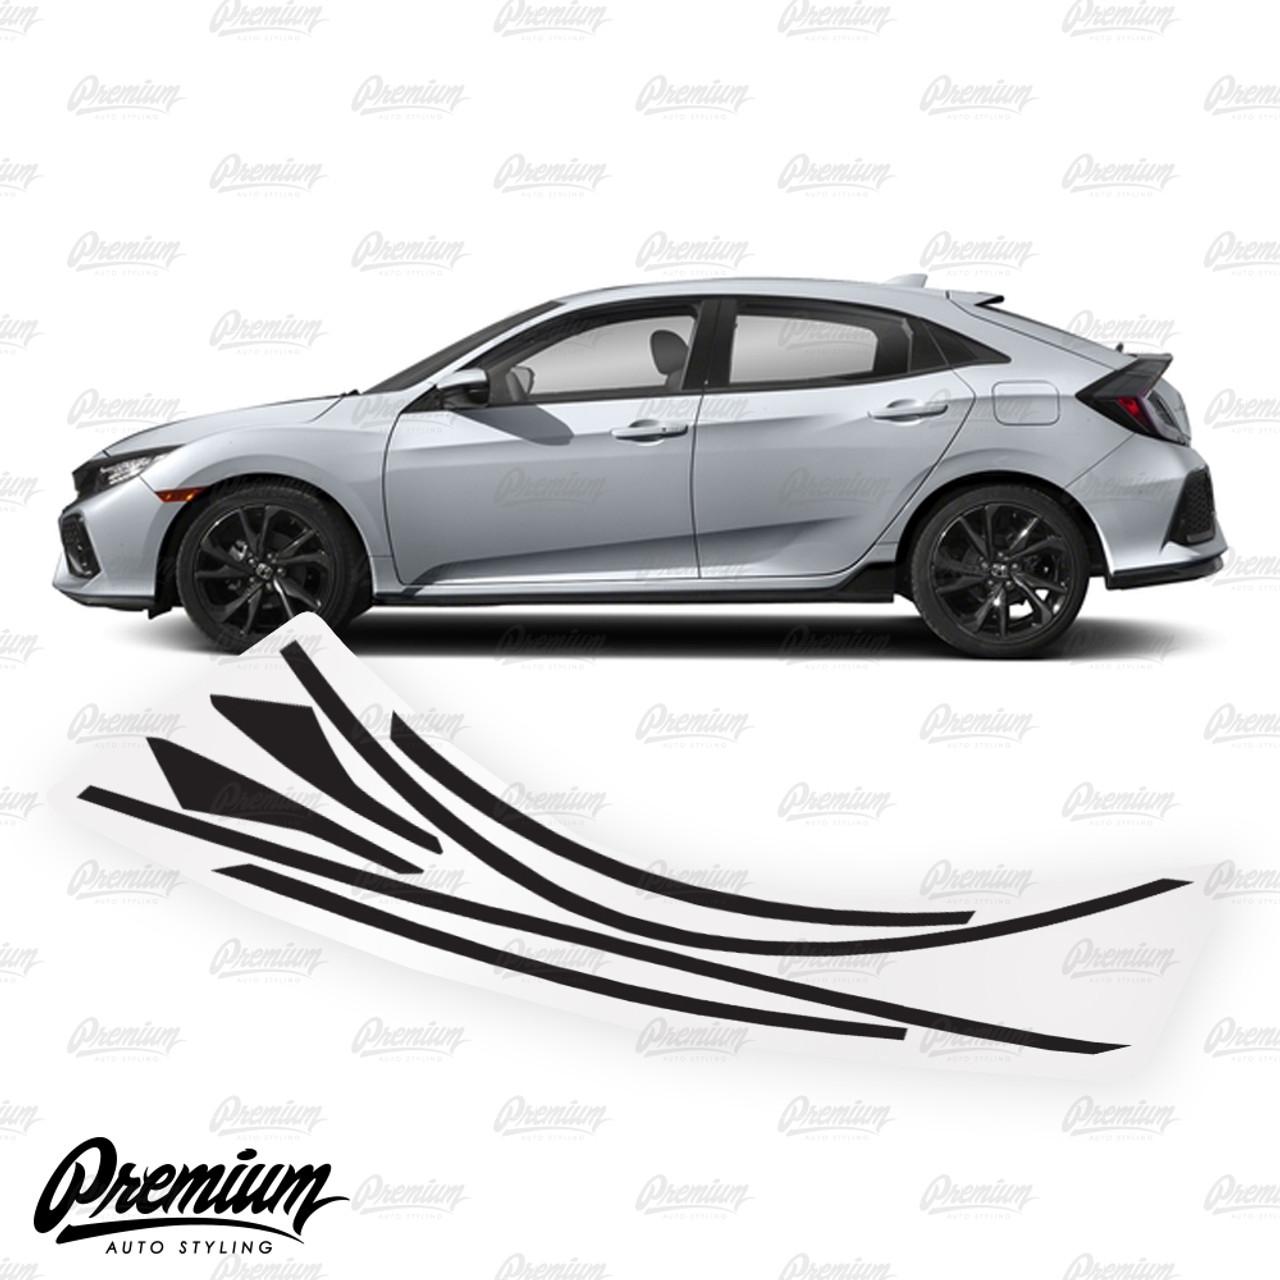 Window Trim Chrome Delete Vinyl Overlay Kit Gloss Black 2016 2020 Honda Civic Hatchback Premium Auto Styling